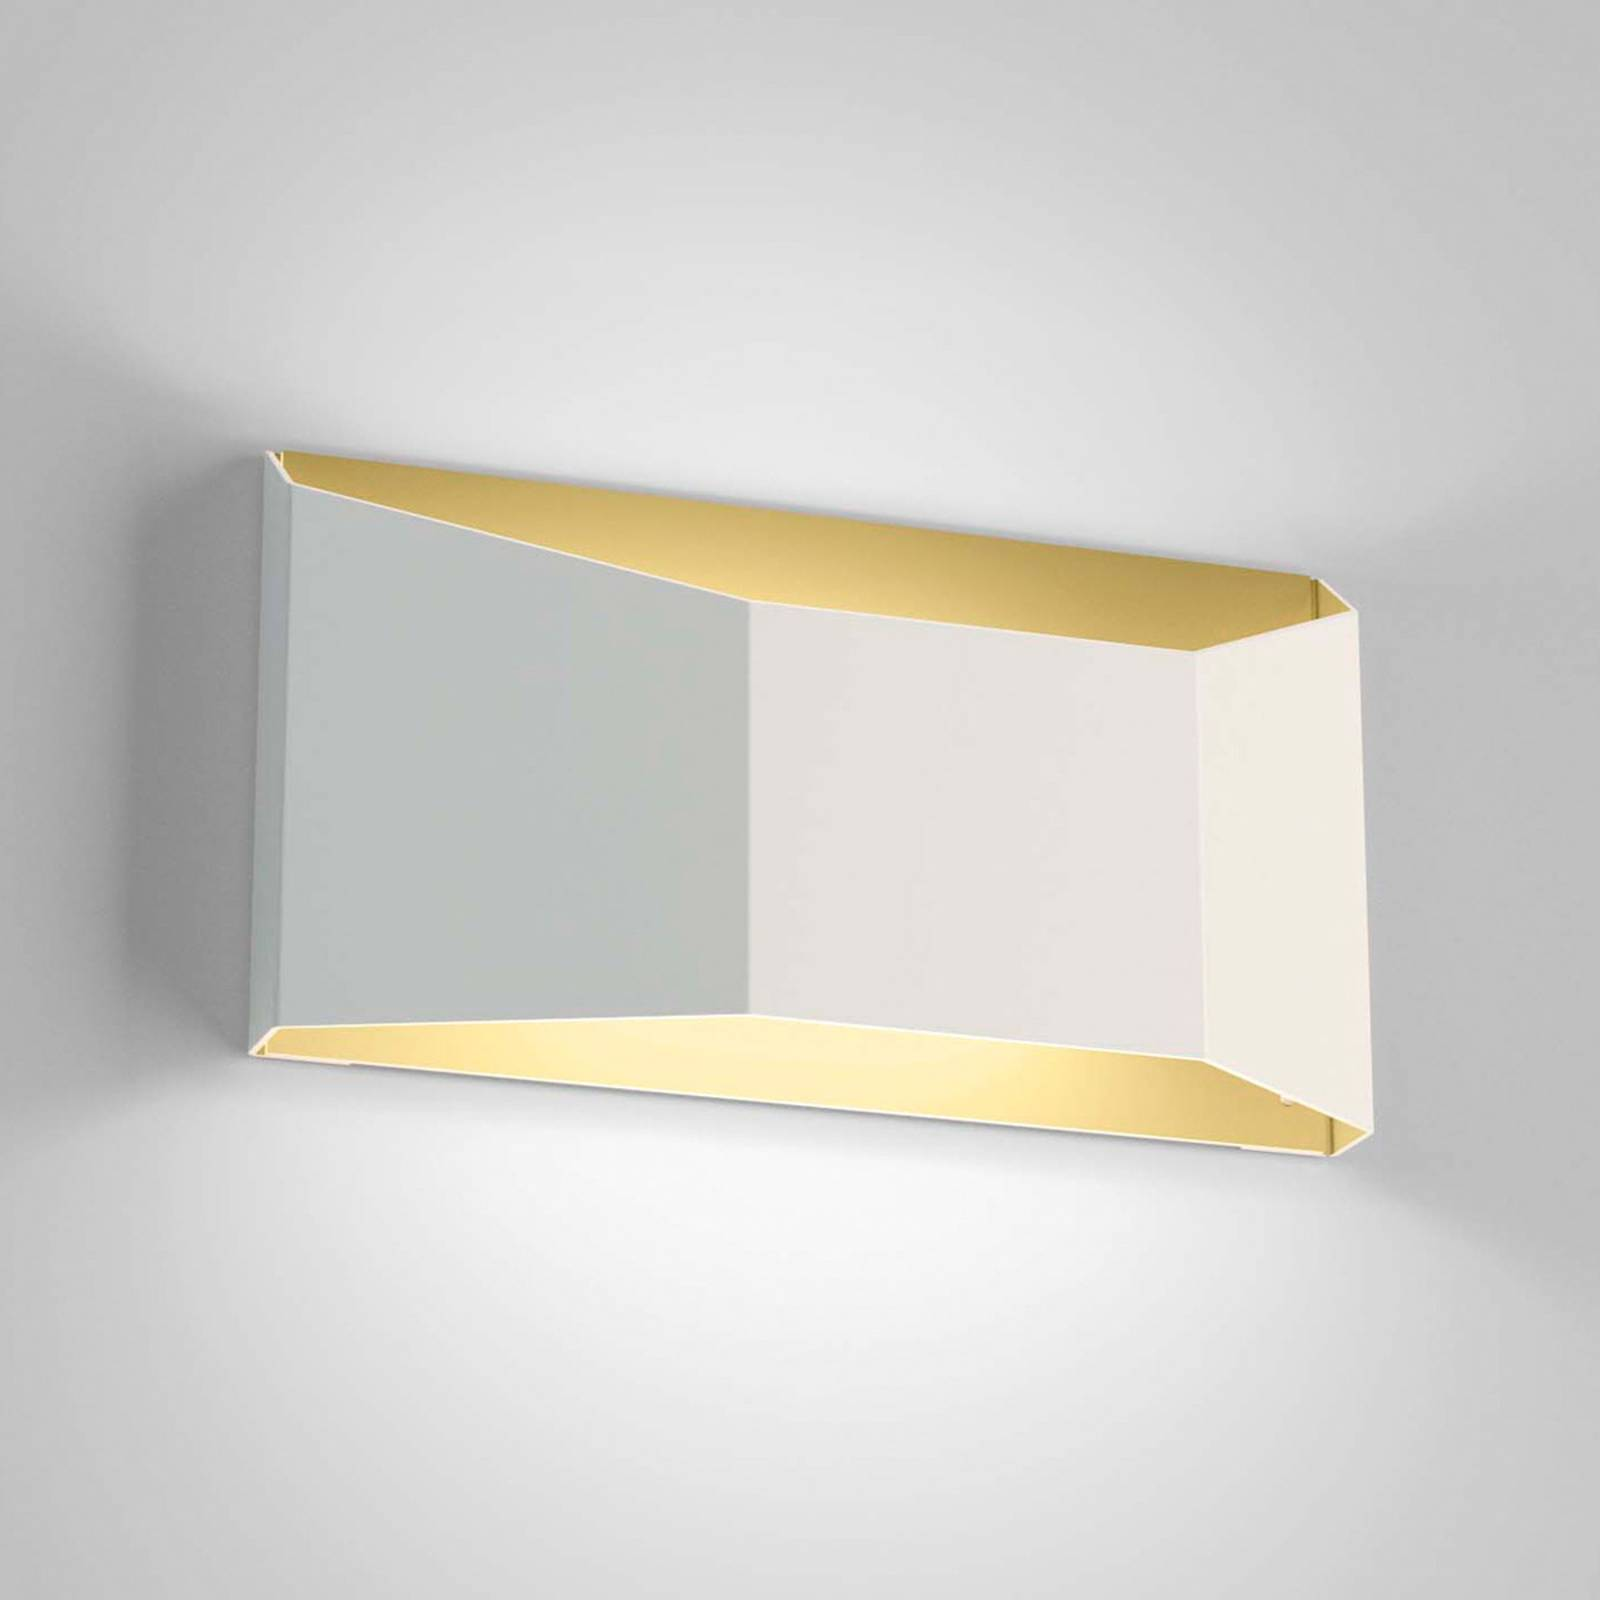 Dreidimensional gestaltete LED-Wandleuchte Esa